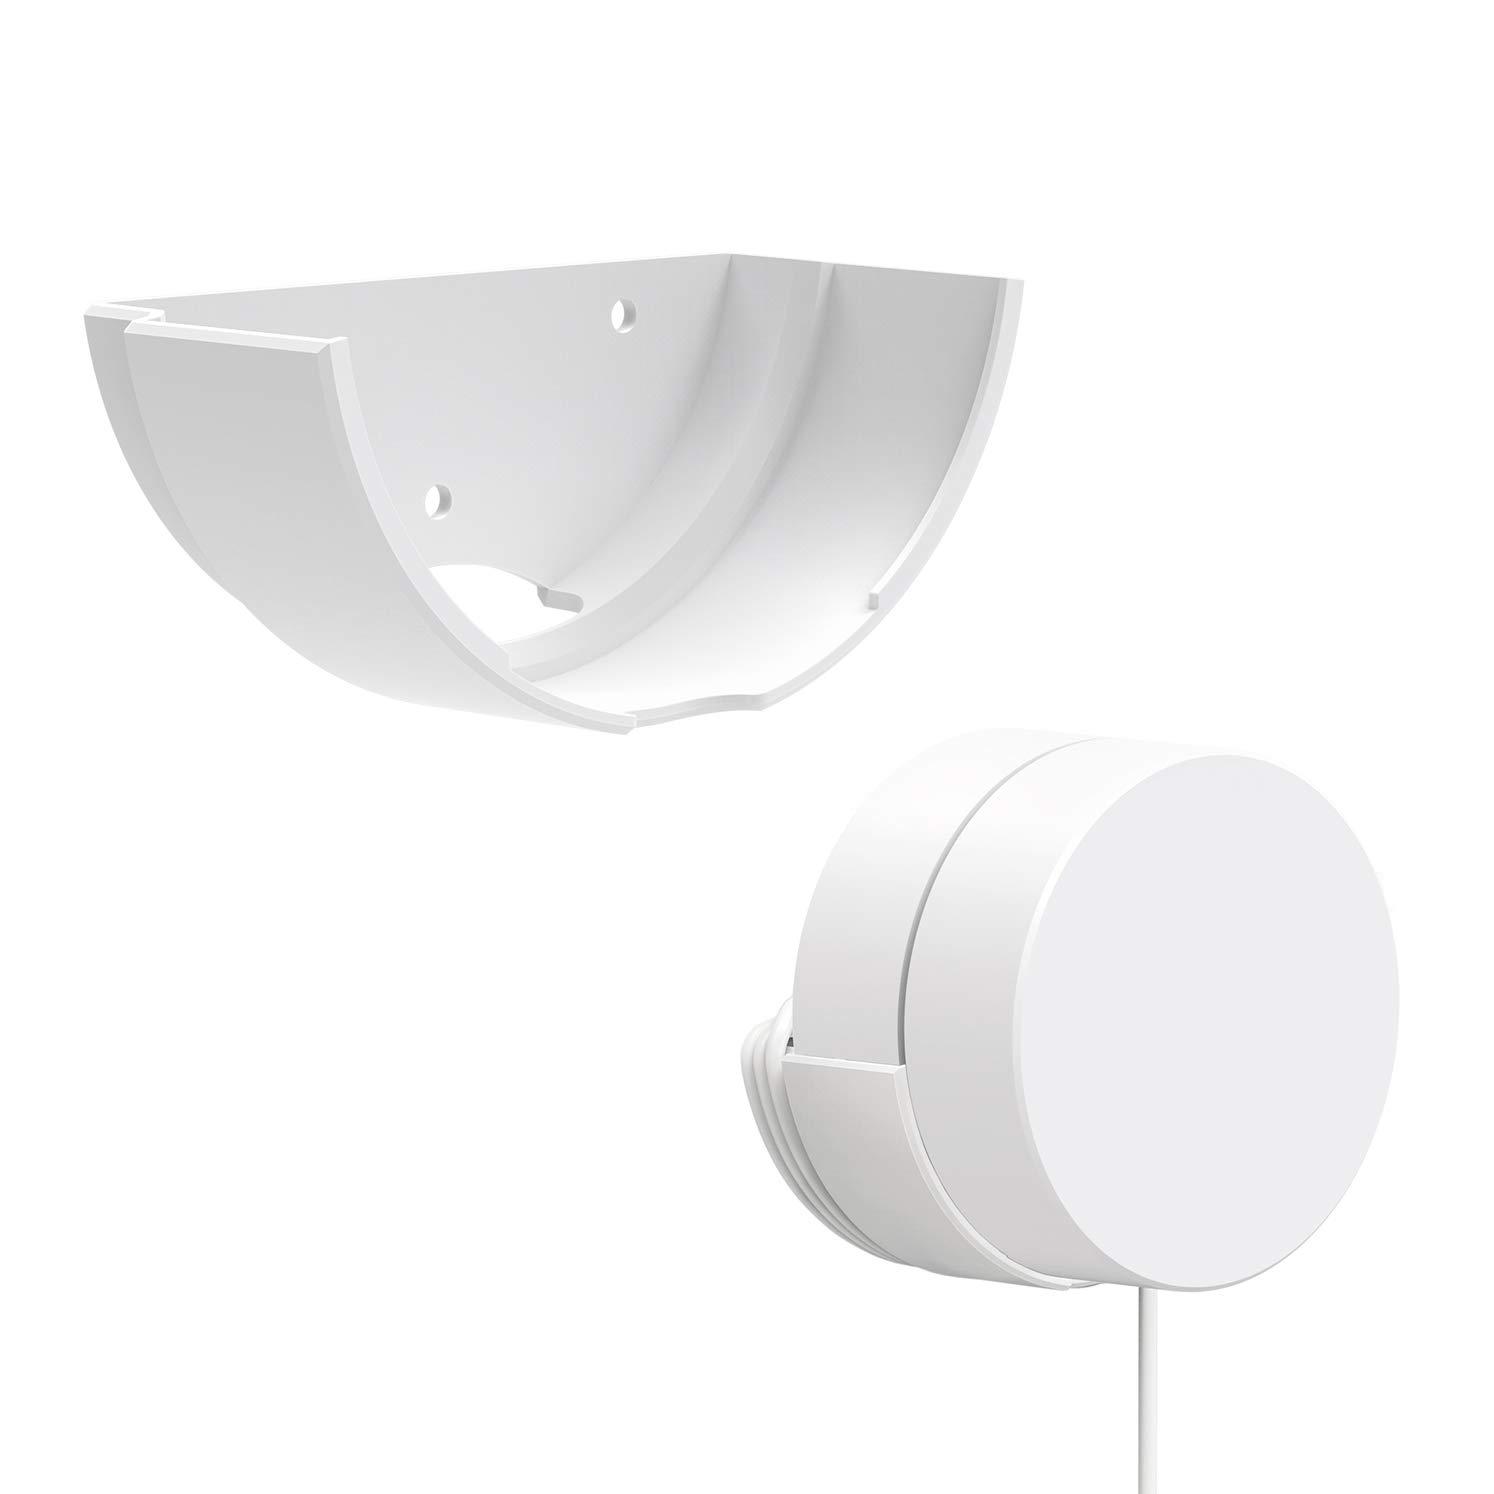 Mrount Google WiFi Wall Mount Bracket,Fits Snugly to Google WiFi,Best Design for Winding Power Cord,1 Pack